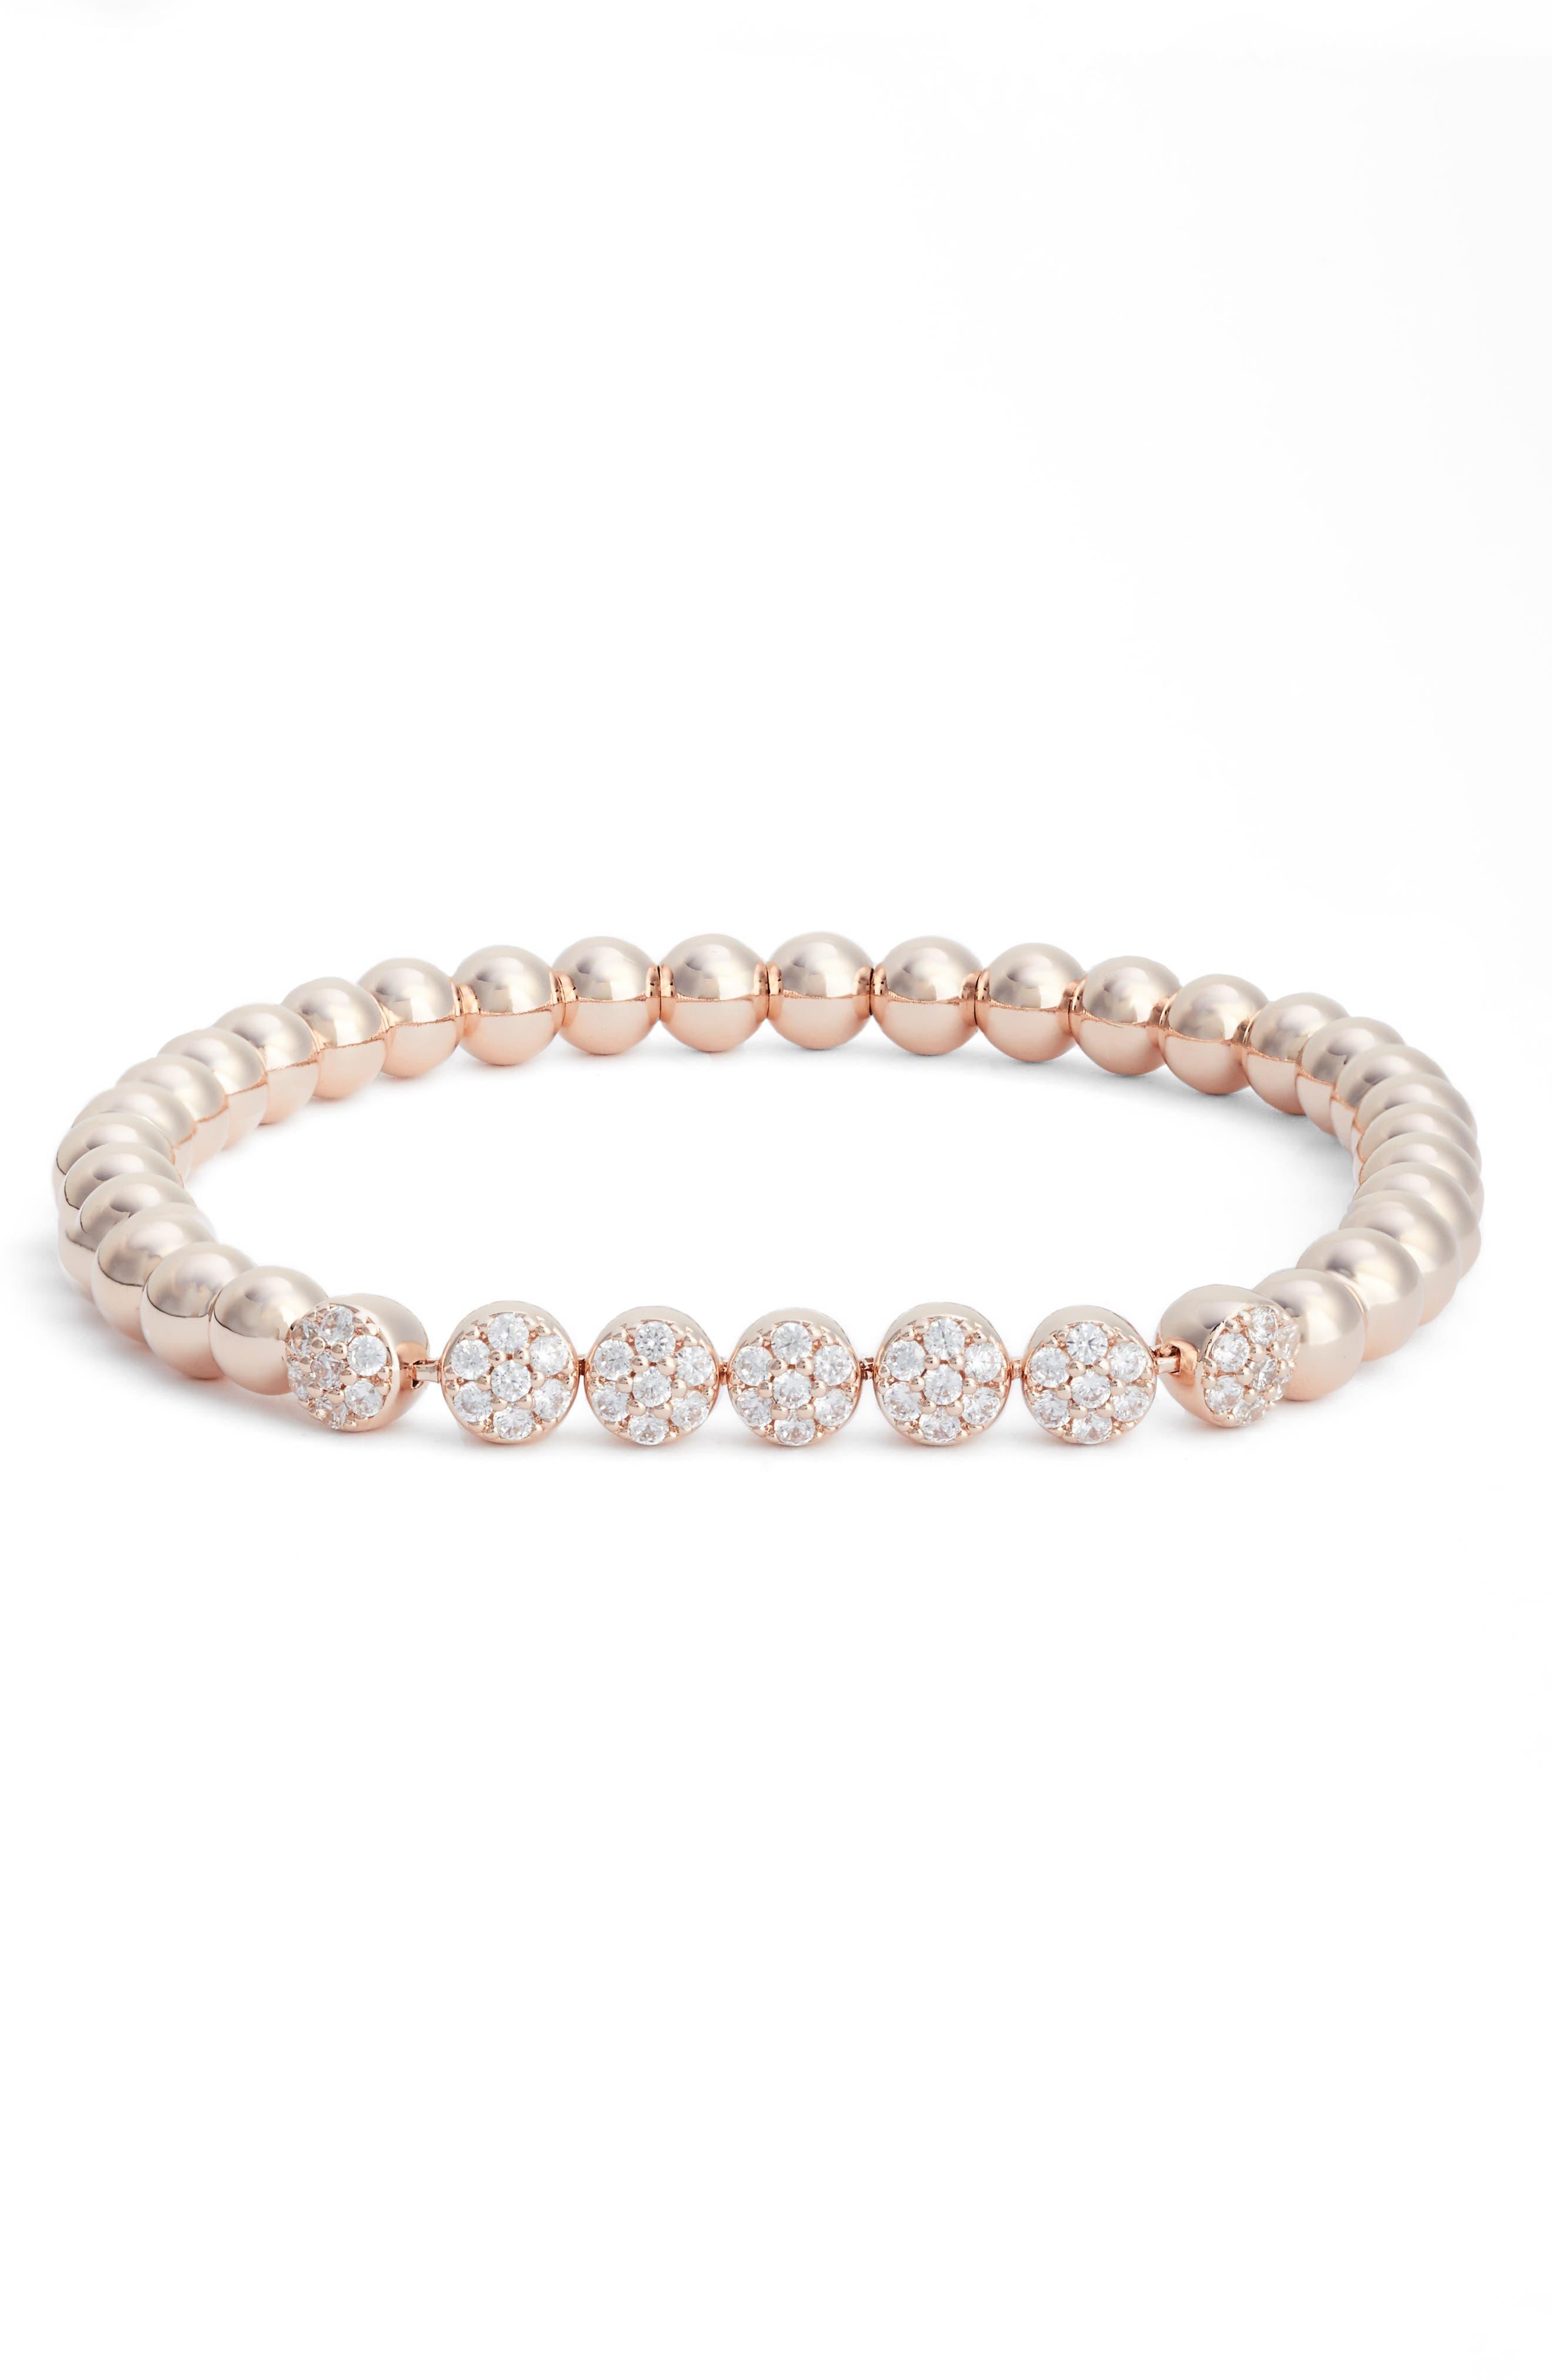 Cubic Zirconia Bracelet,                             Main thumbnail 1, color,                             Rose Gold/ Clear